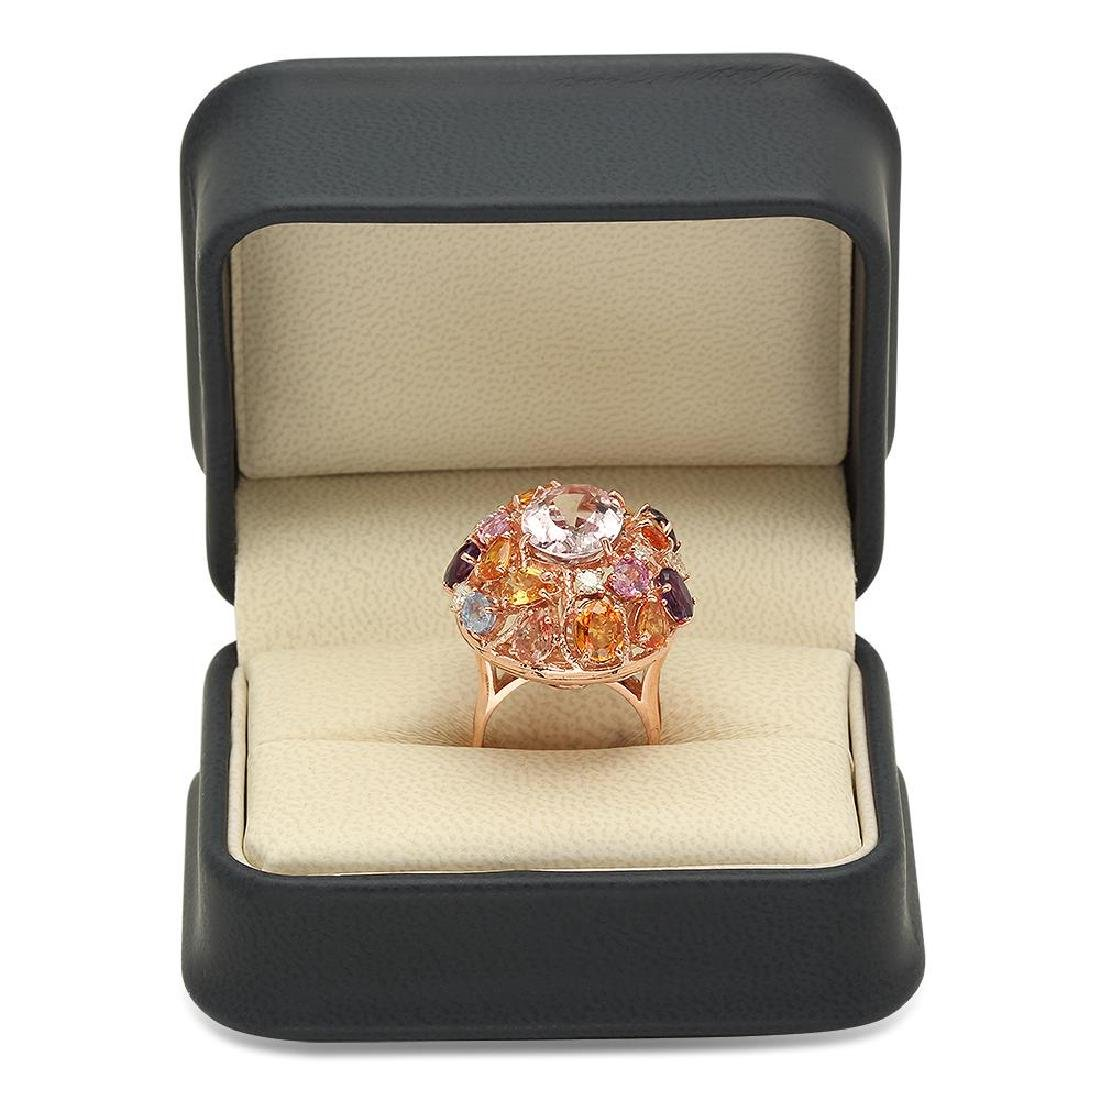 14K Gold 7.32ct Morganite 5.96ct Amethyst, Sapphire - 4